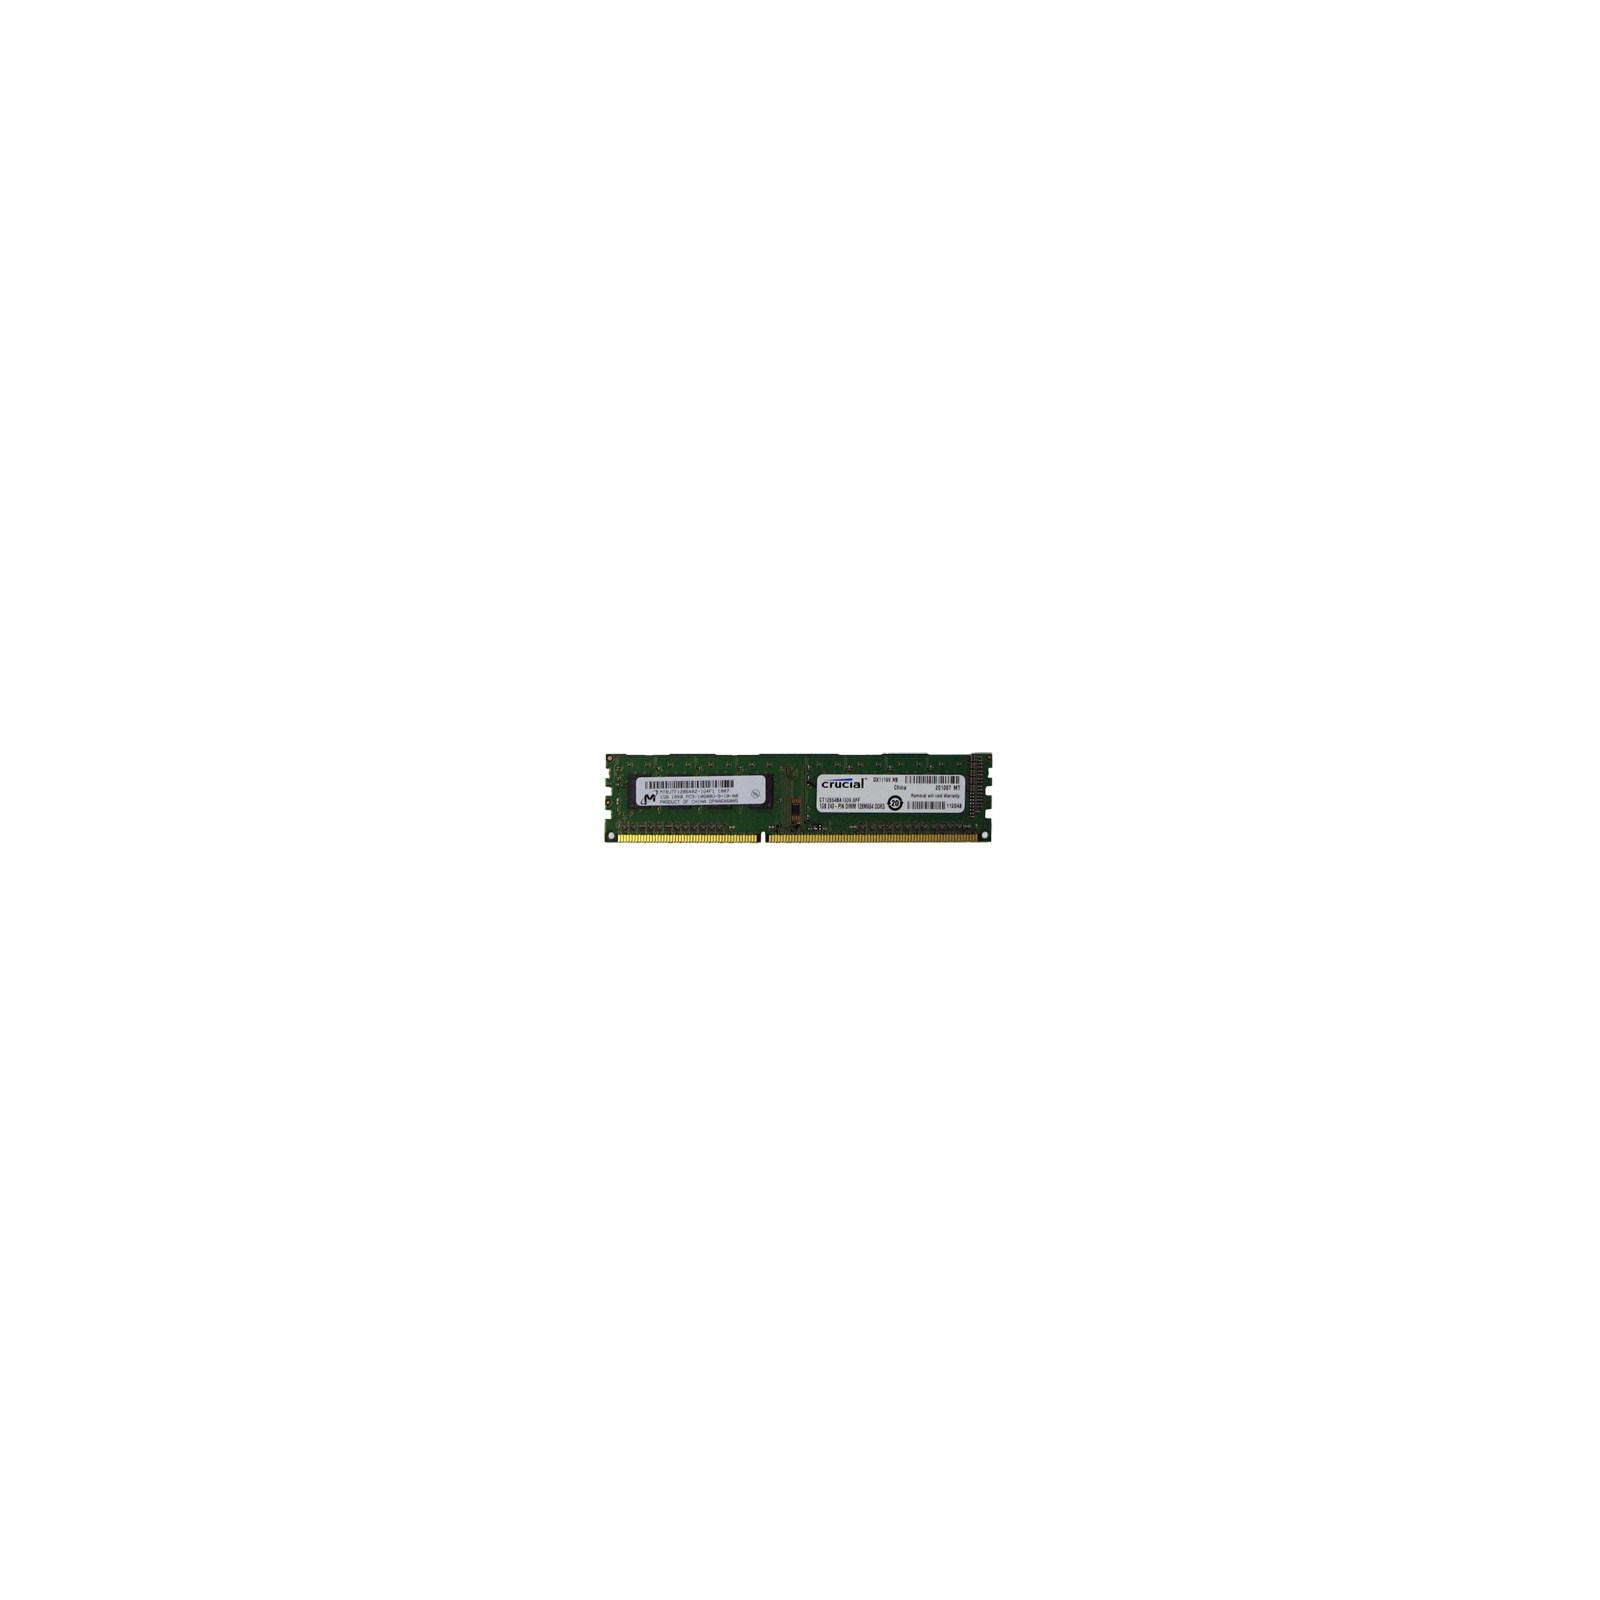 Модуль памяти для компьютера DDR3 2GB 1333 MHz MICRON (CT25664BA1339)